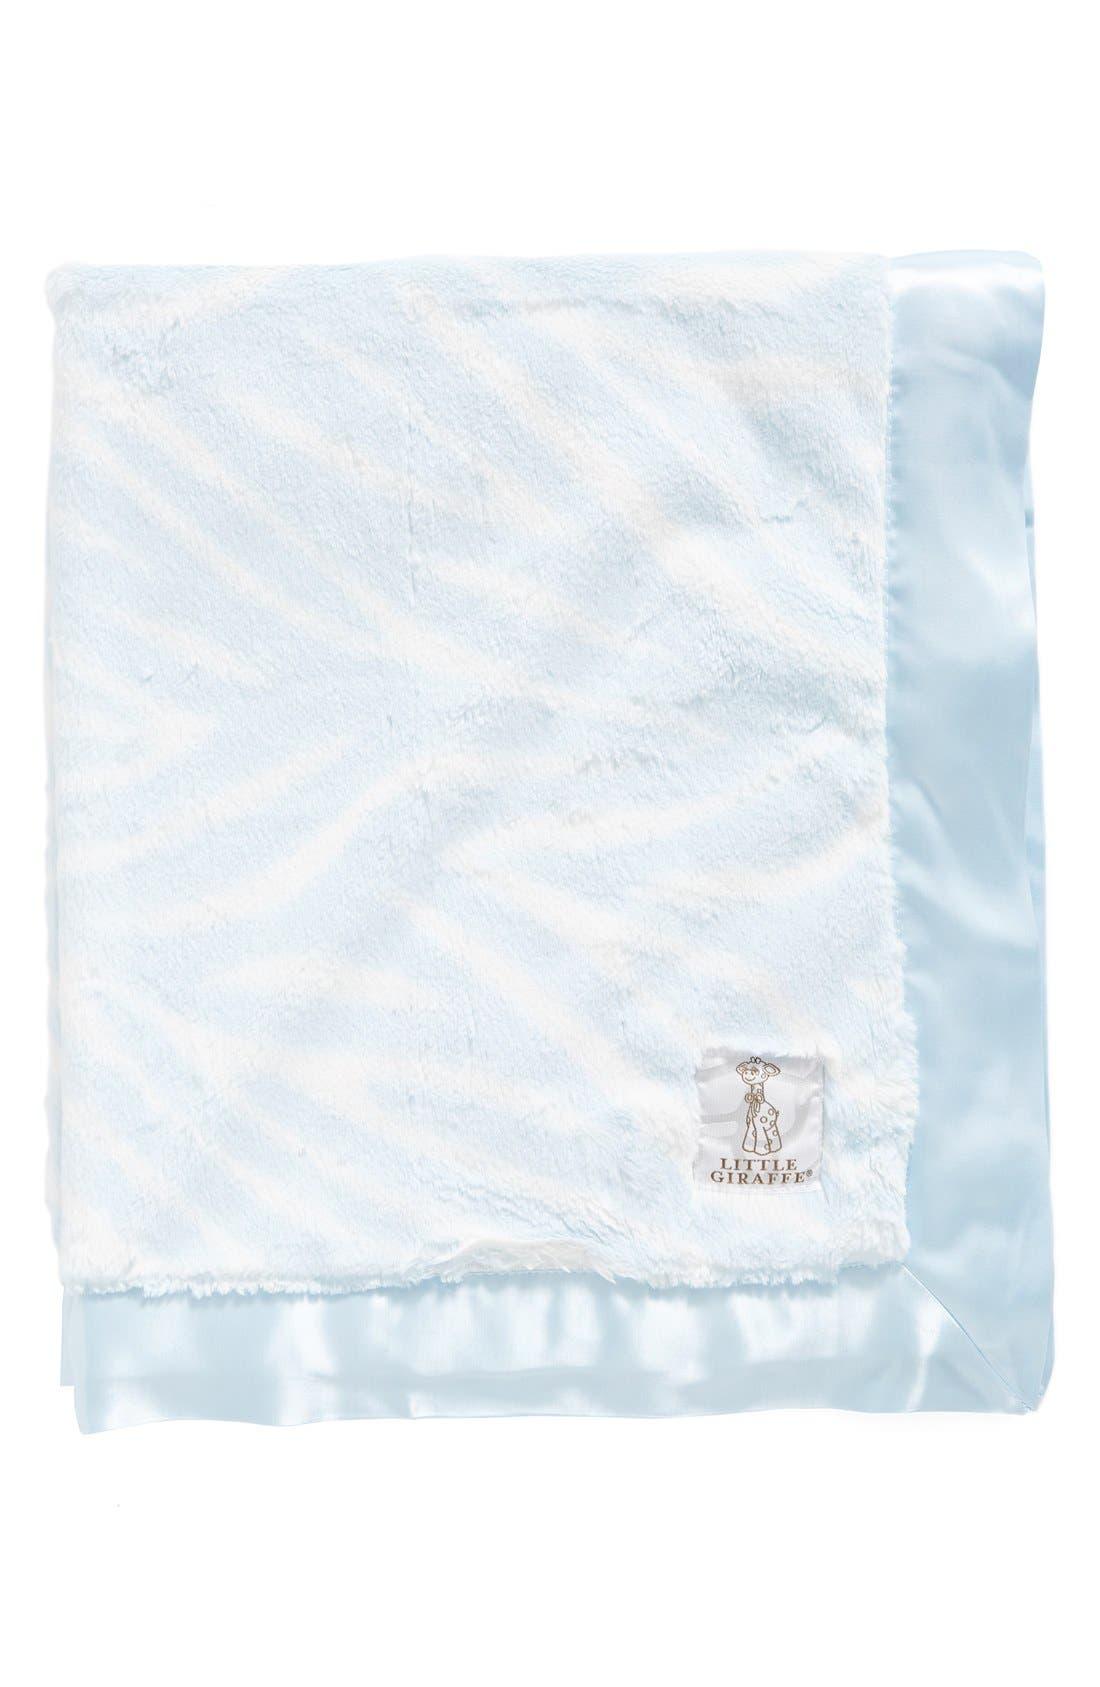 Luxe<sup>™</sup> Zebra Print Blanket,                             Main thumbnail 1, color,                             Blue